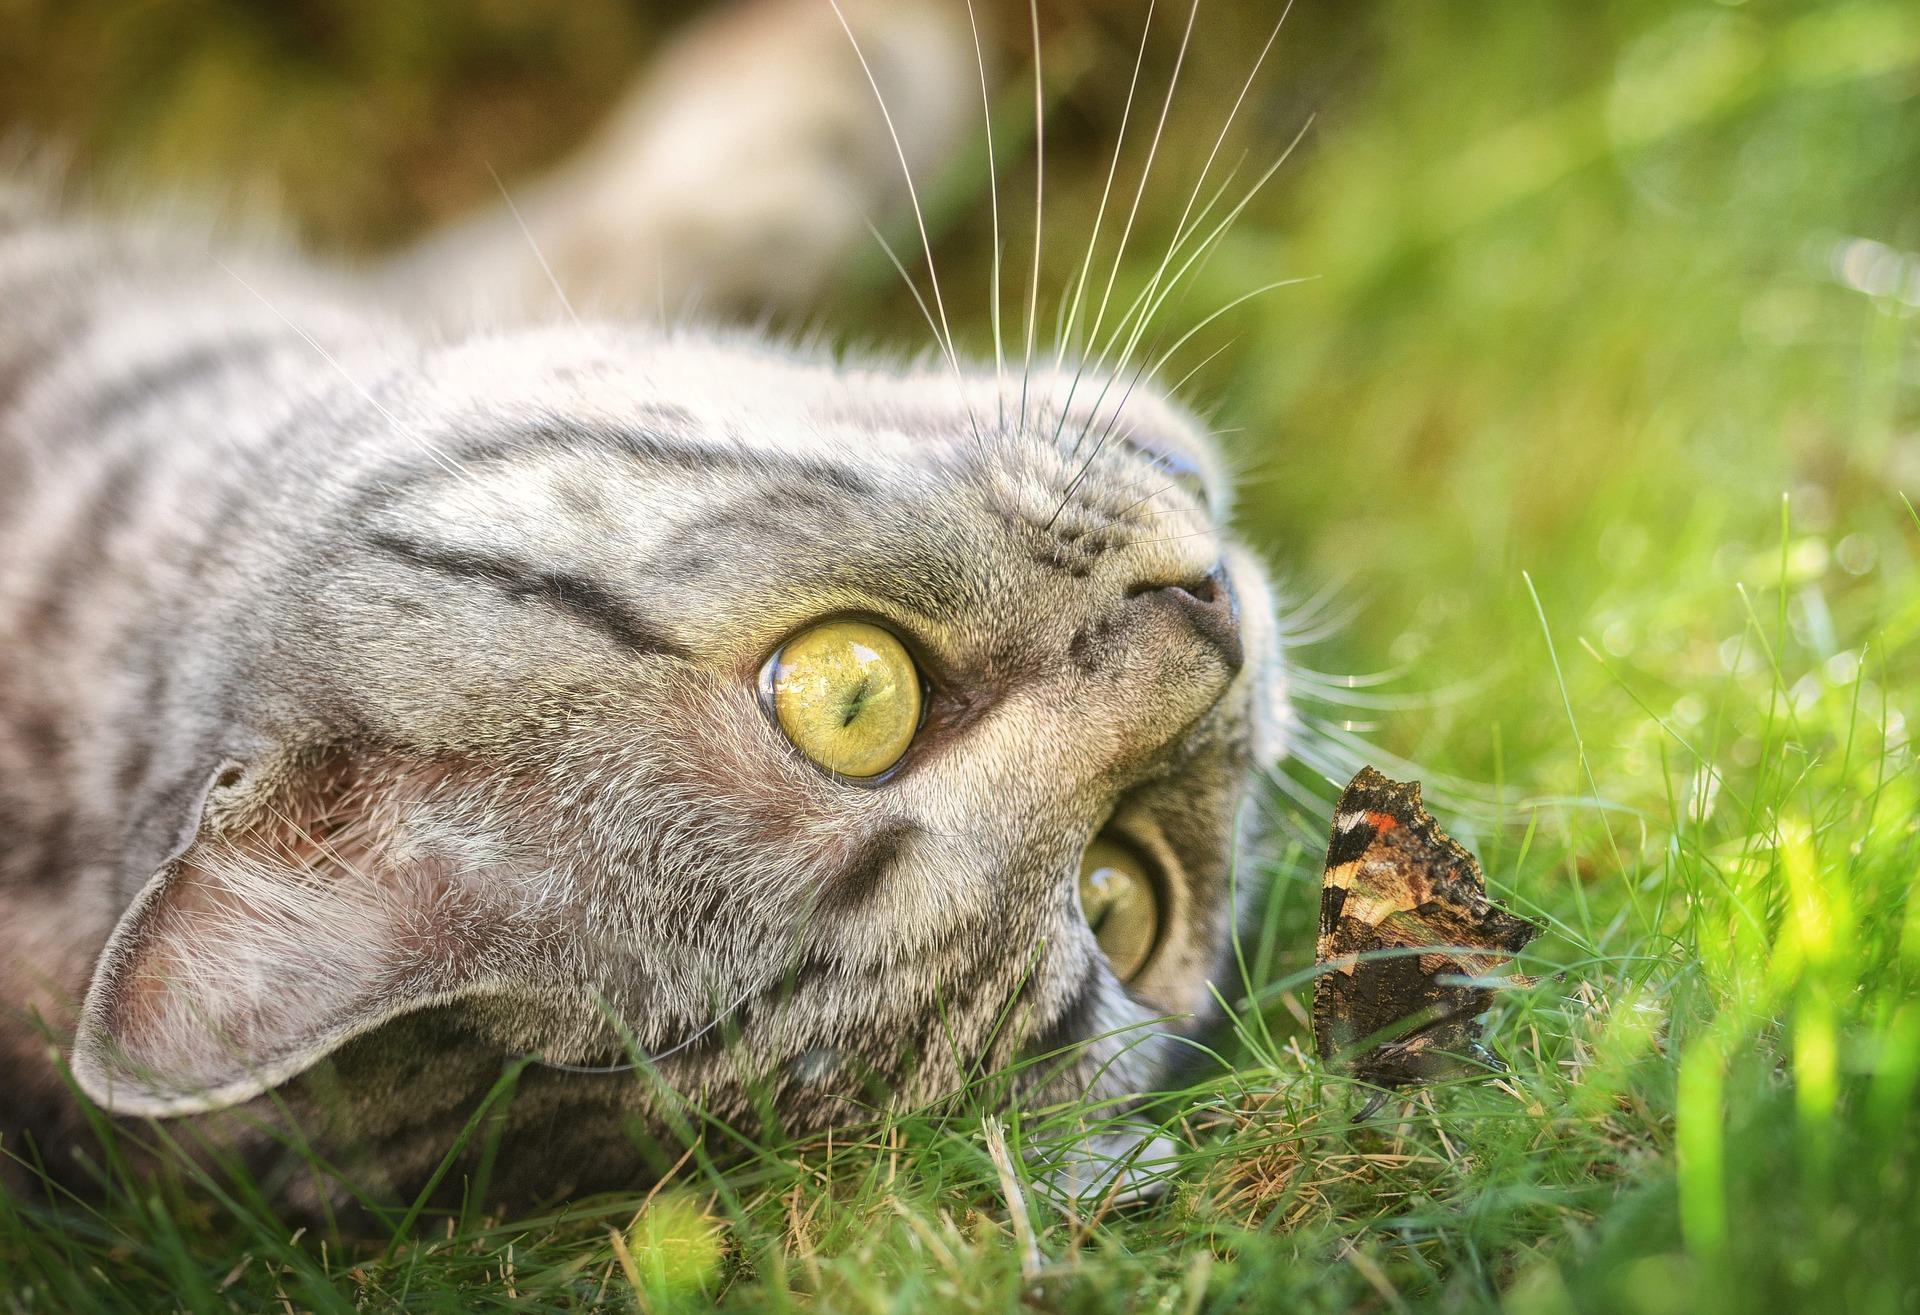 animalerie british shorthair animalerie chat 12 1